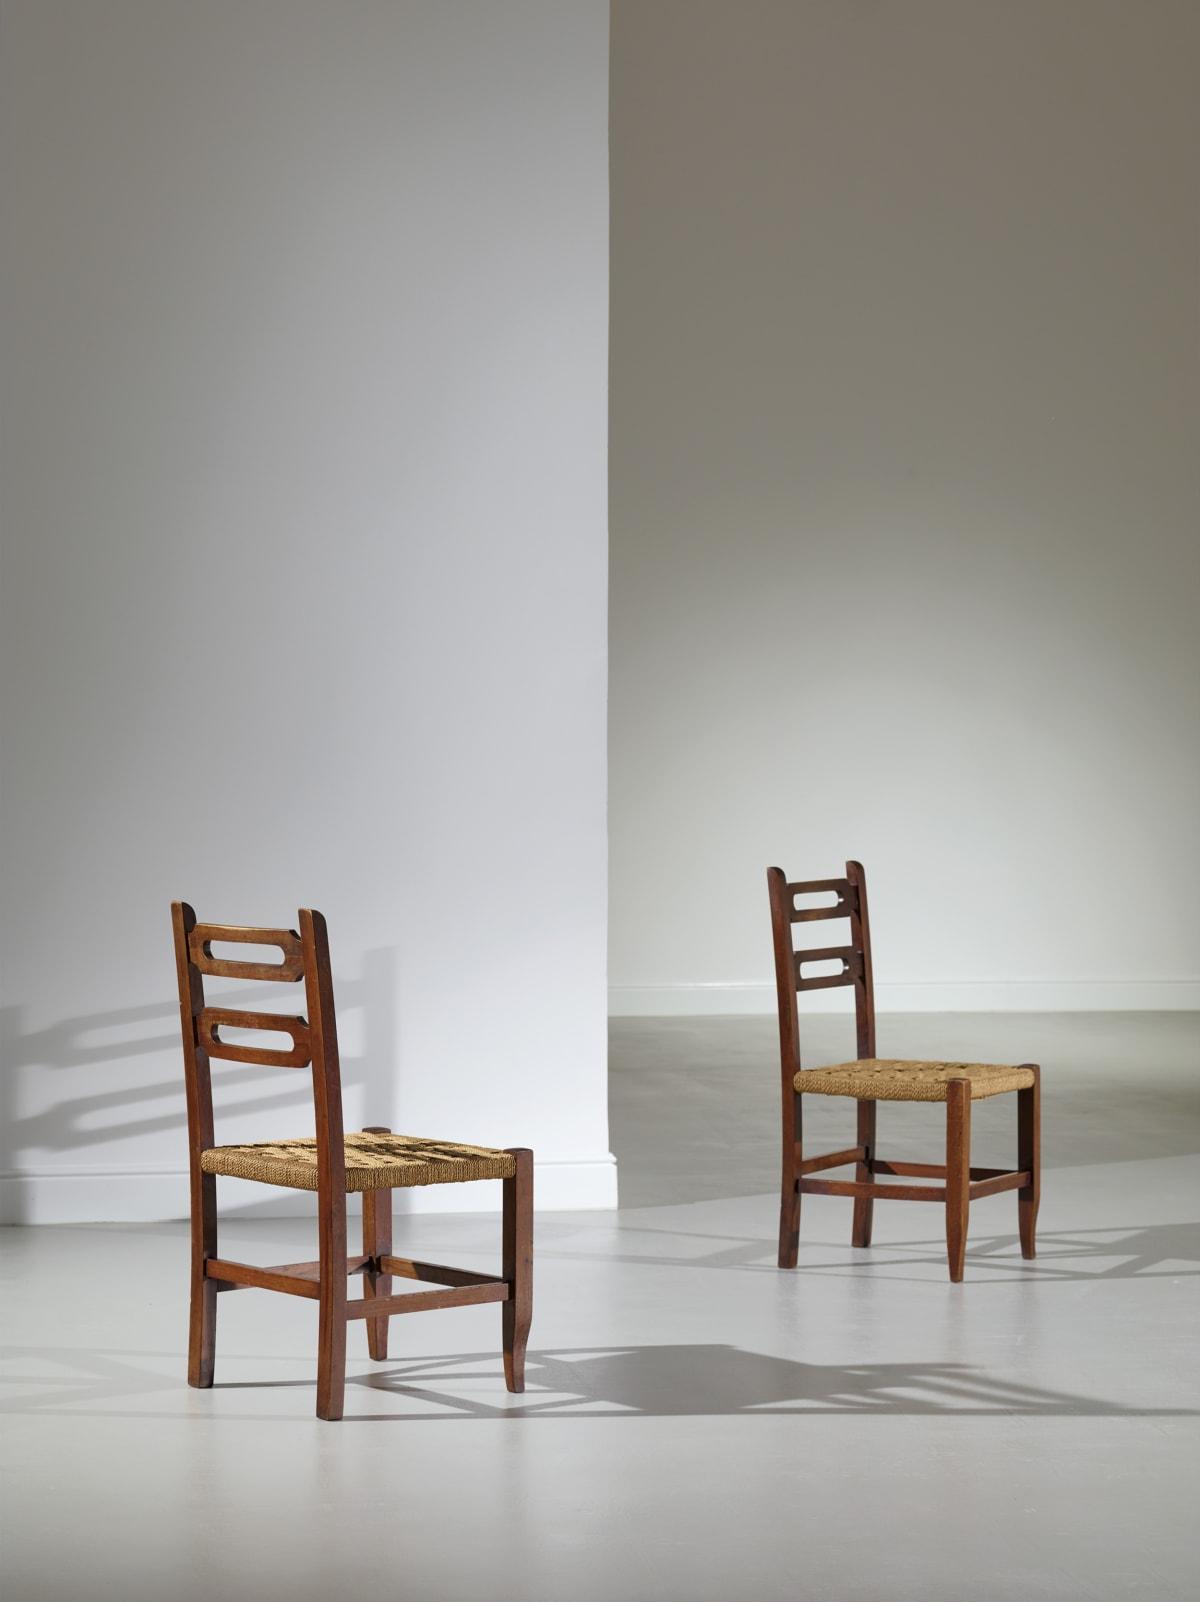 Gio Ponti & Emilio Lancia, Pair of chairs